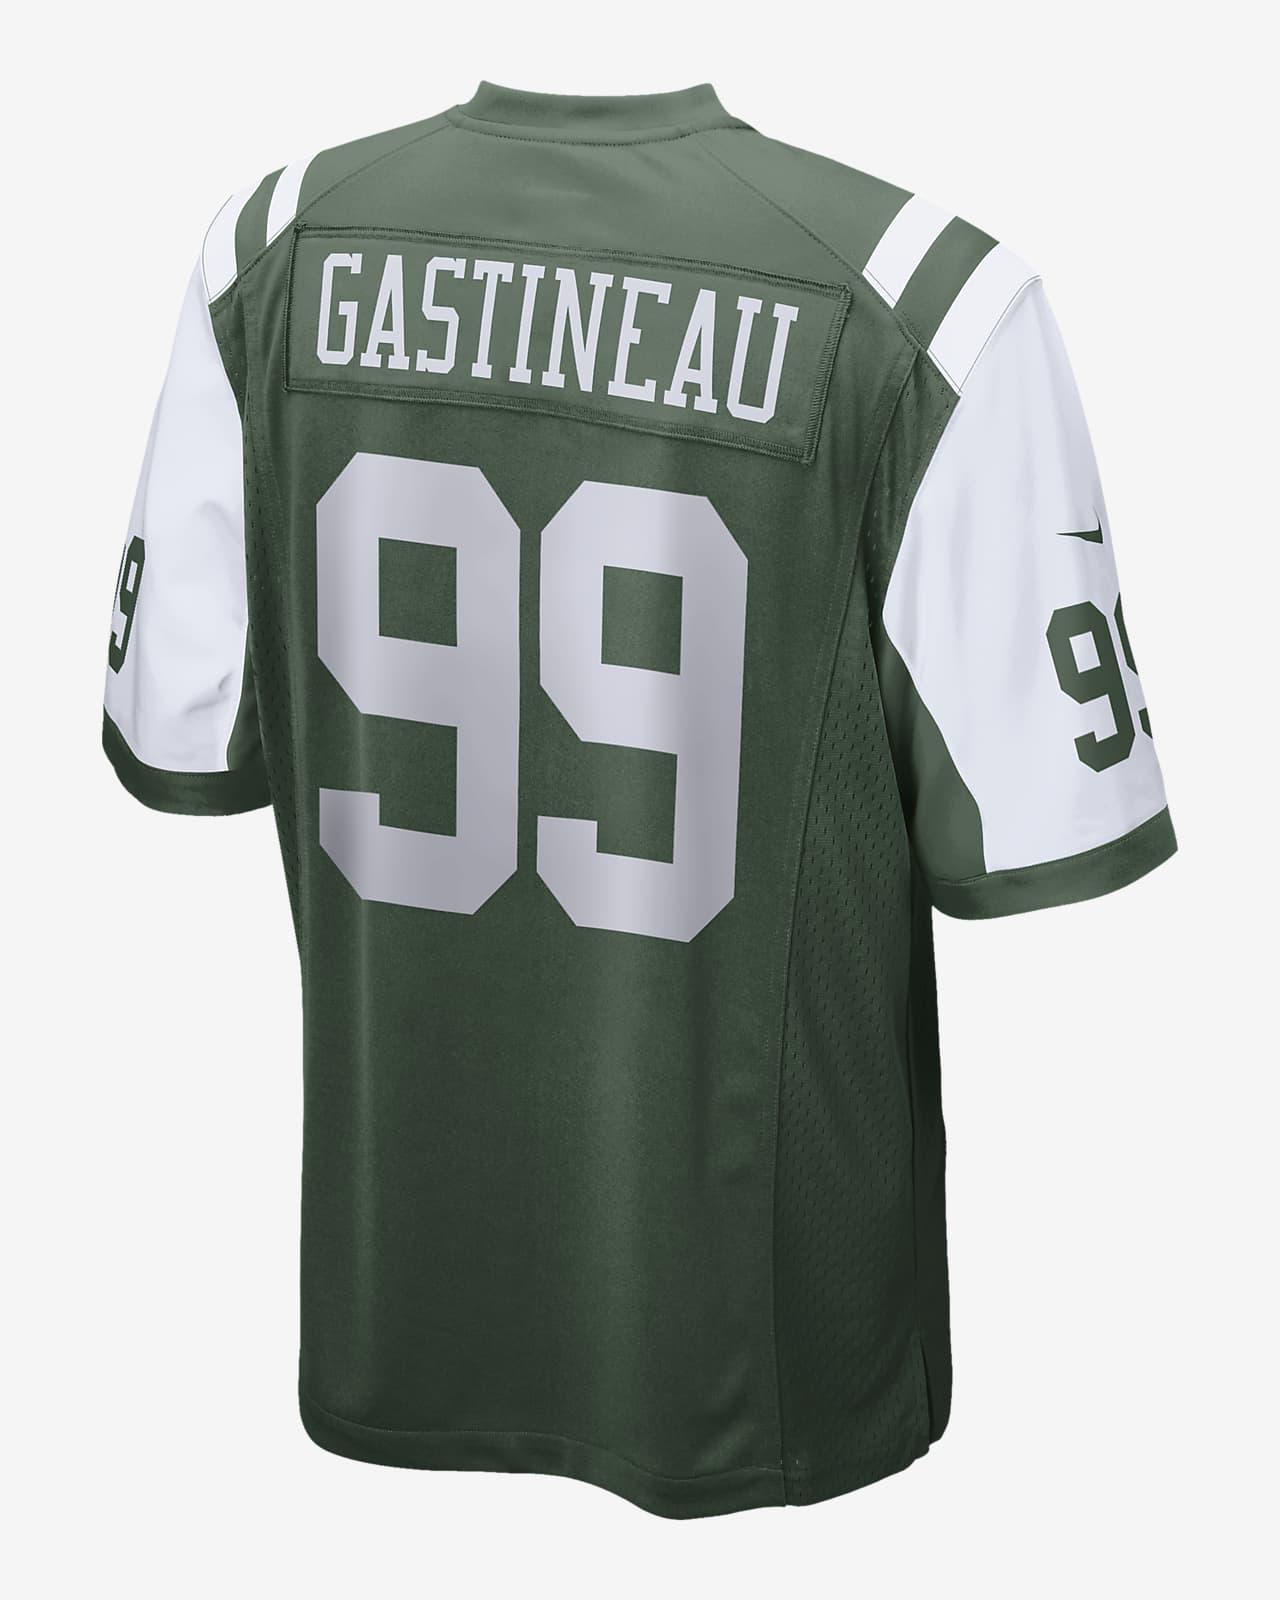 NFL New York Jets (Mark Gastineau) Game Men's Football Jersey